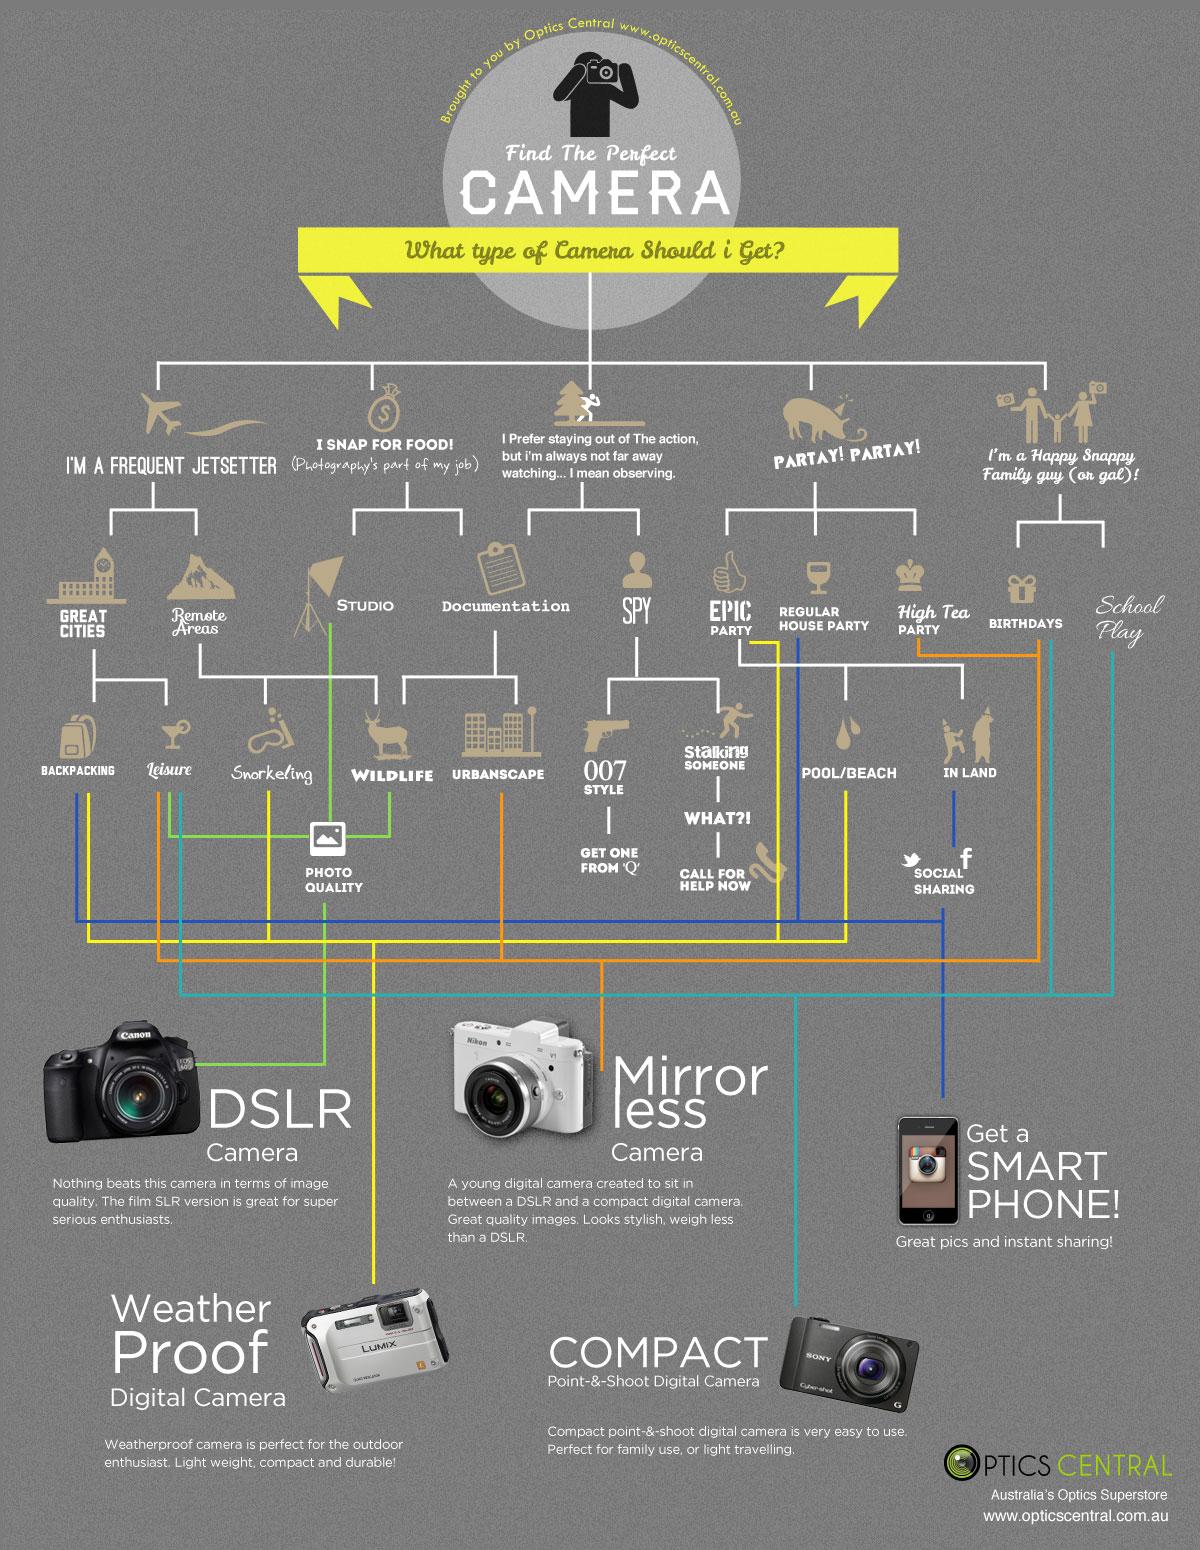 camera-guide-type-flowchart-infographic.jpeg